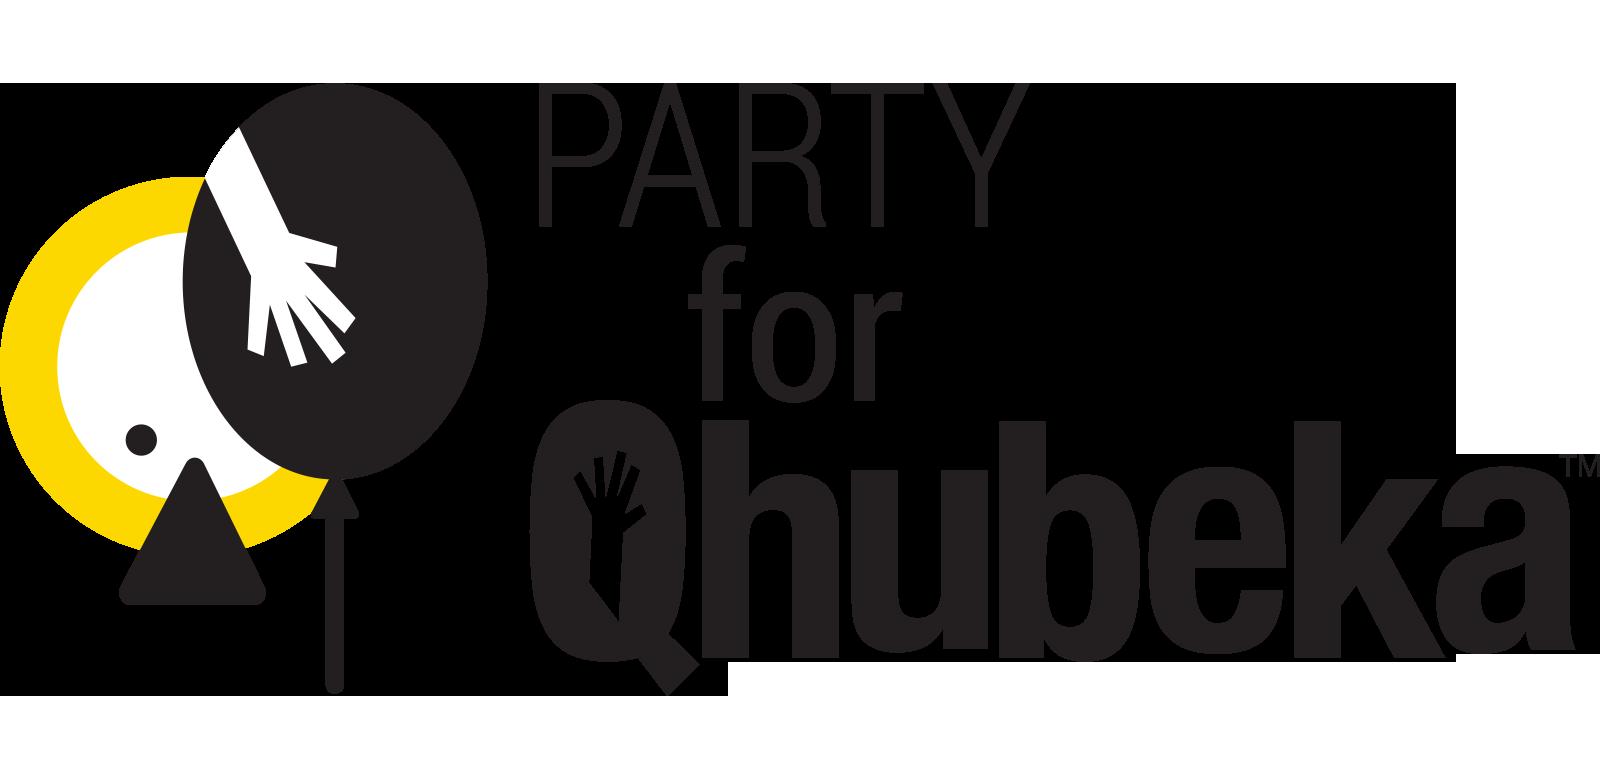 Party For Qhubeka